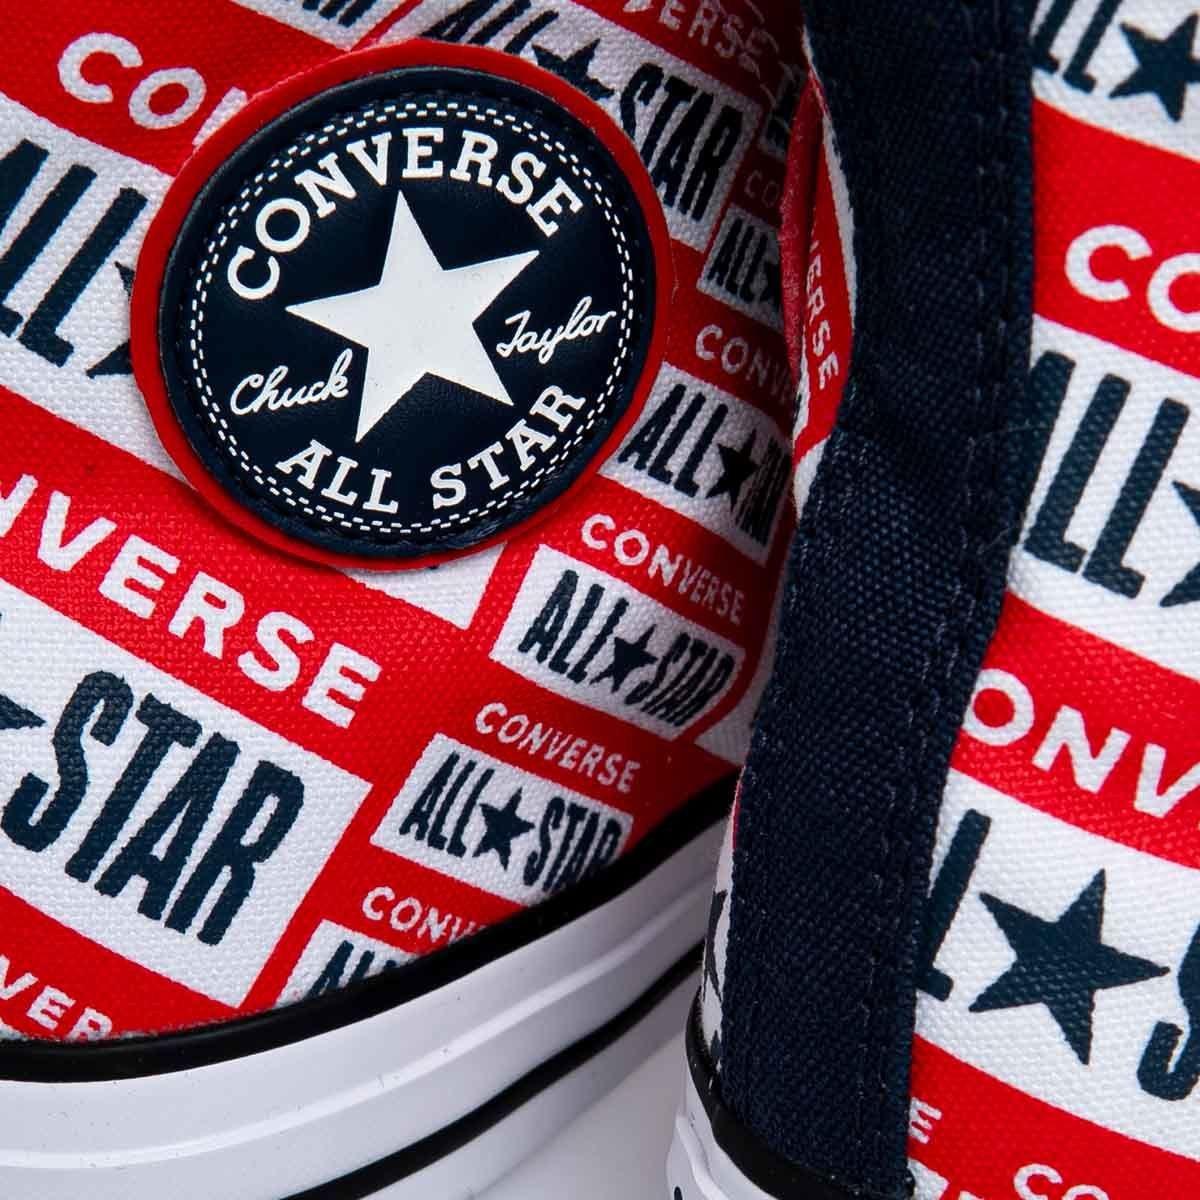 Sneakers buty damskie Converse Chuck Taylor All Star czerwone (166984C)